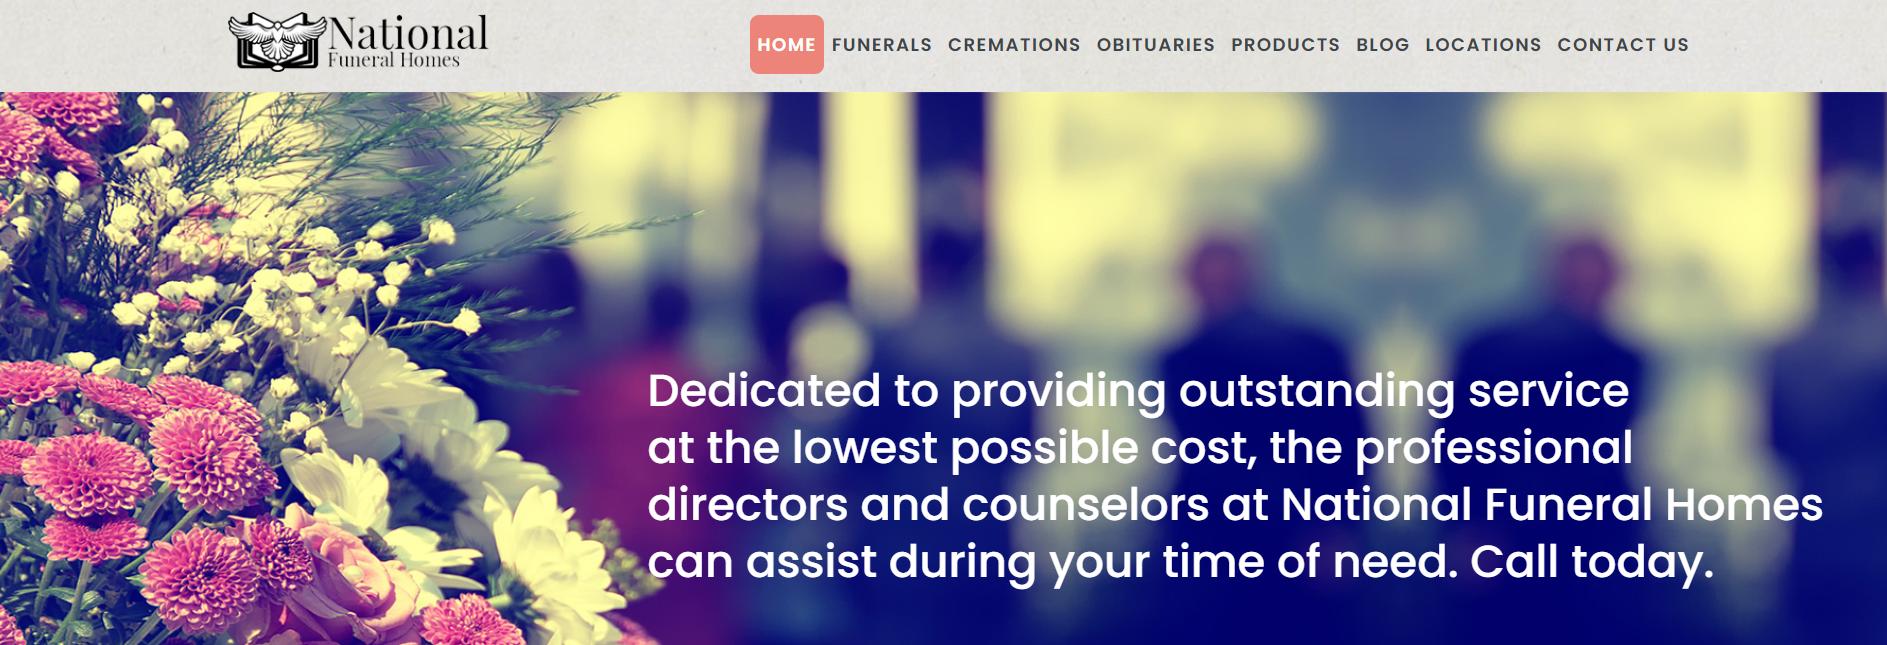 Maspons Funeral Homes in Miami